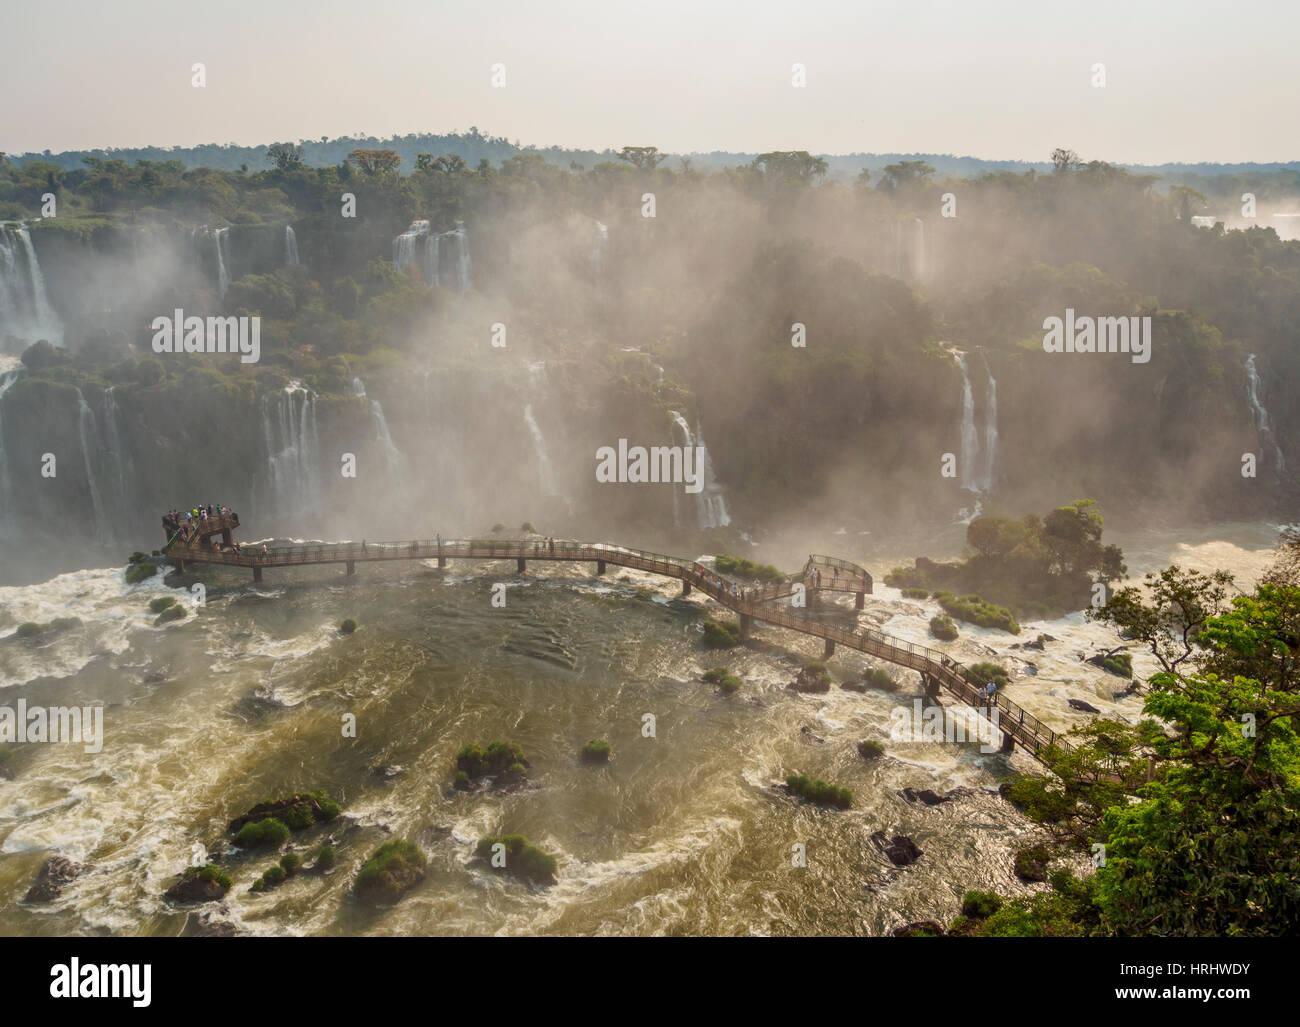 View of the Devil's Throat, part of Iguazu Falls, UNESCO, Foz do Iguacu, State of Parana, Brazil - Stock Image